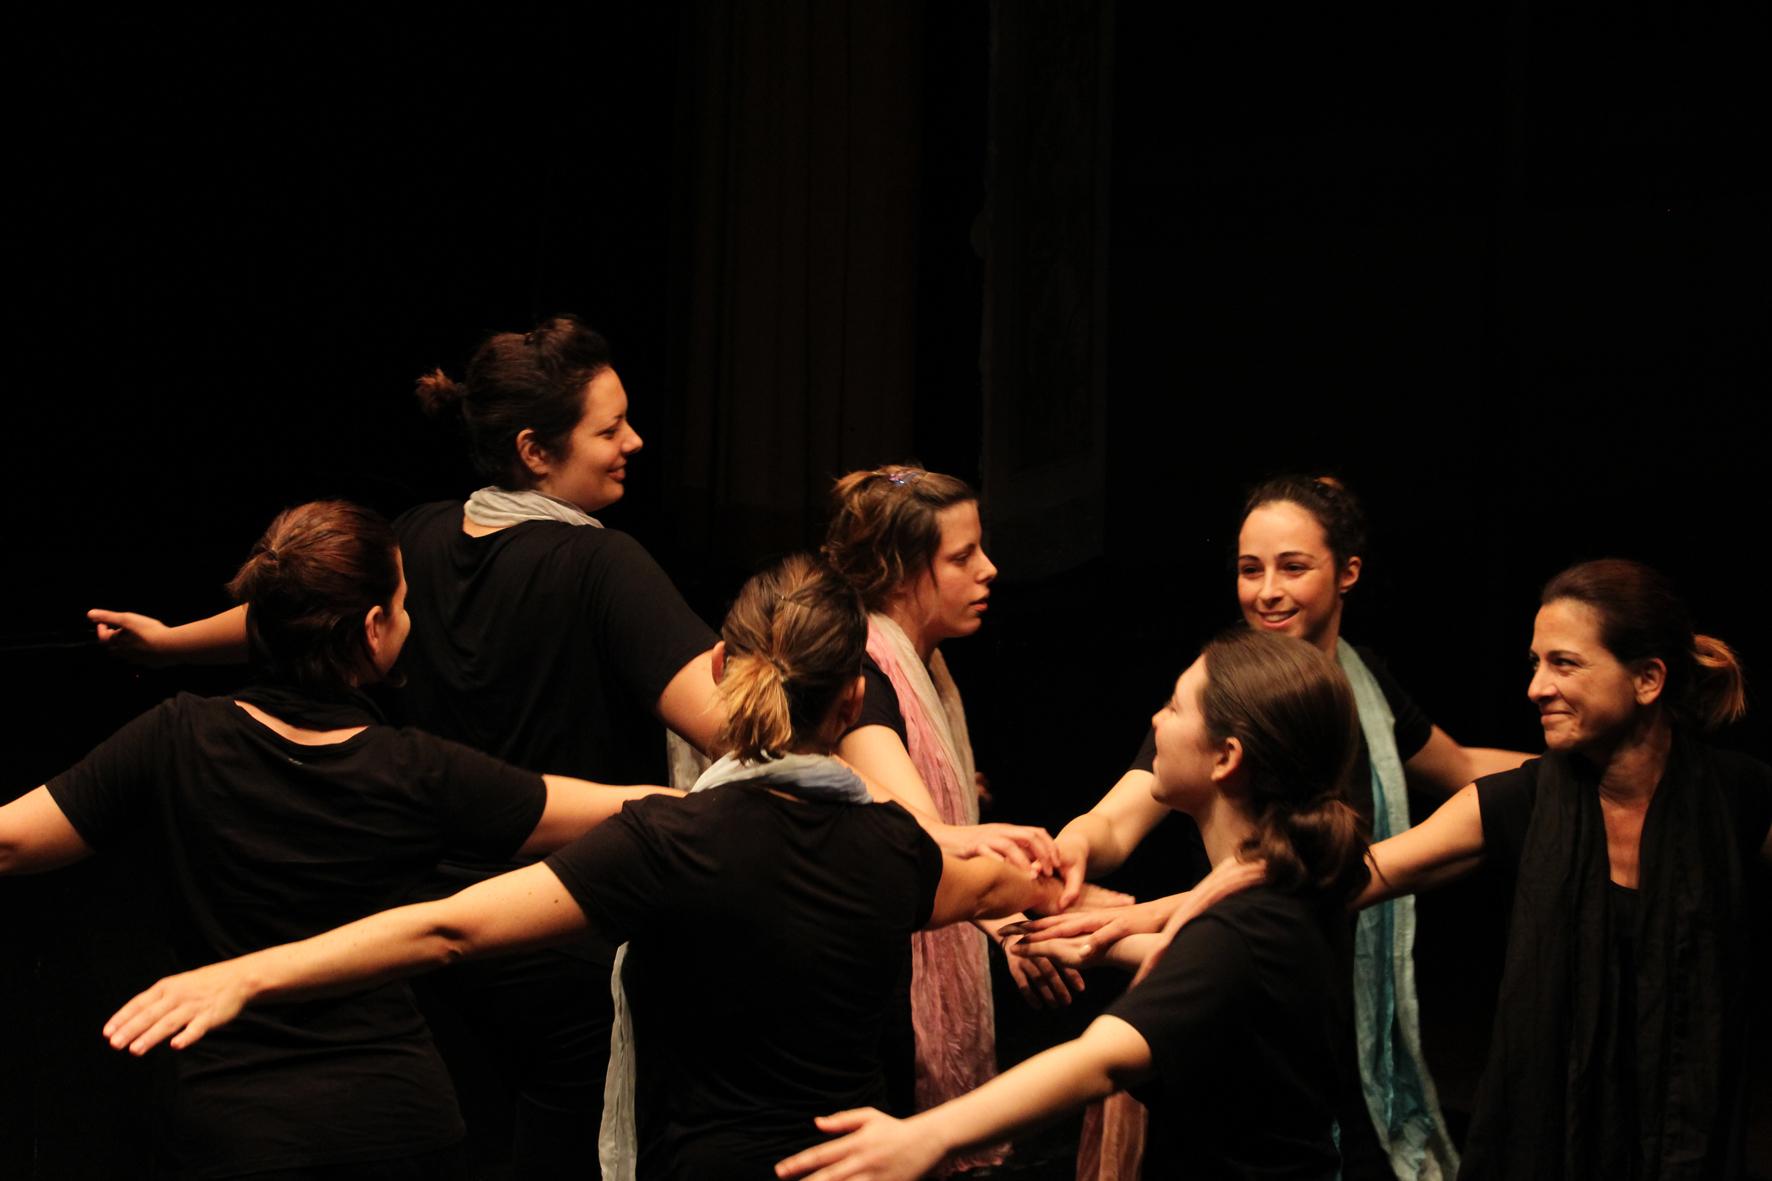 Il Teatro delle Donne